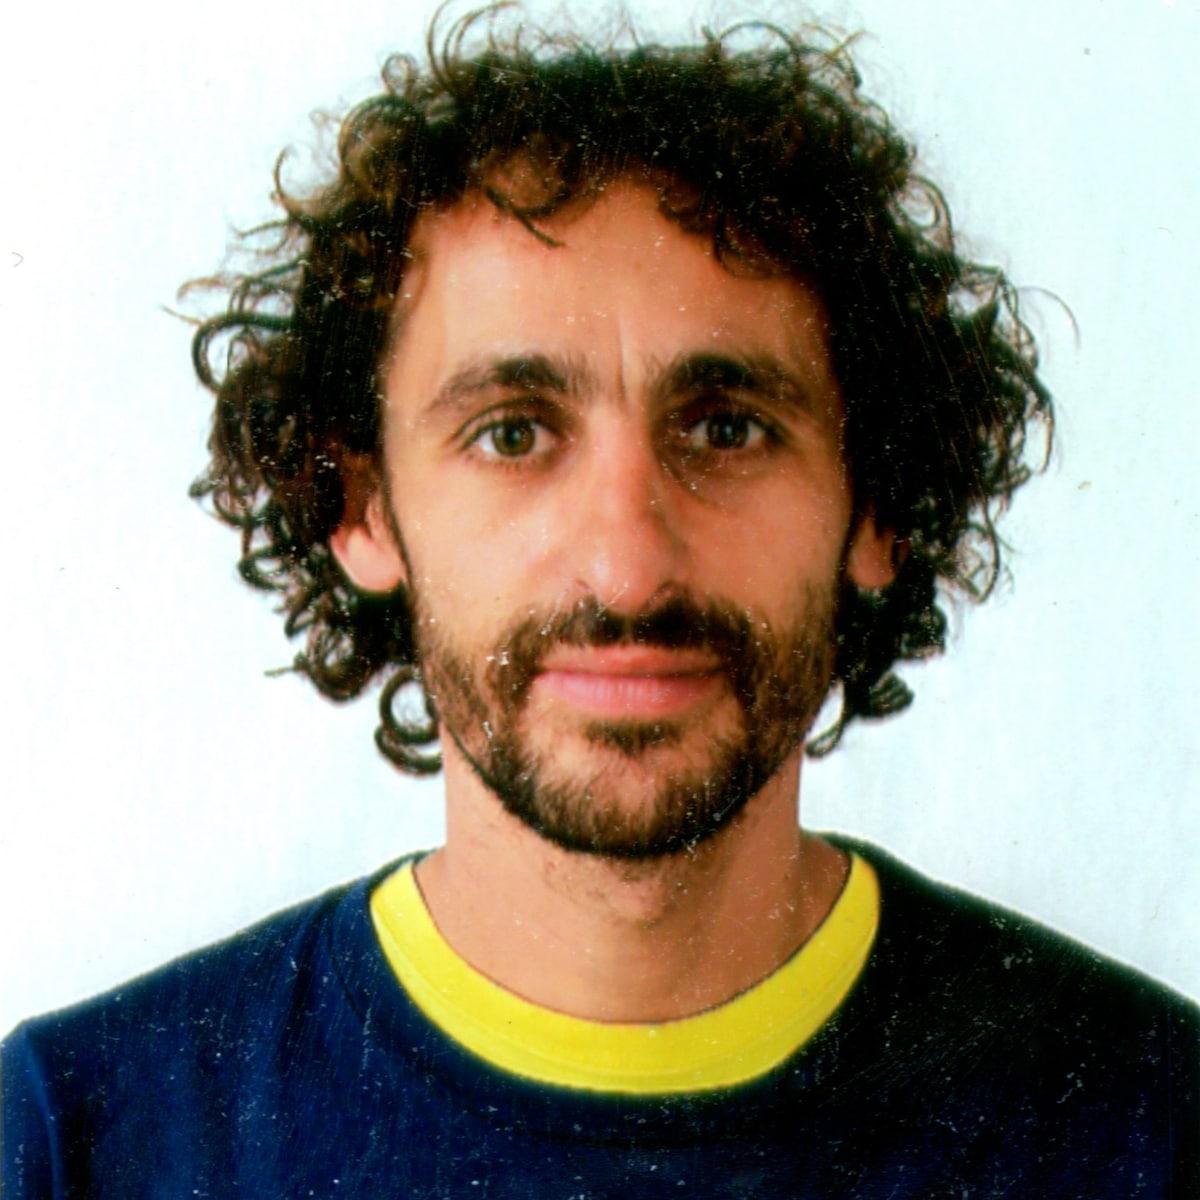 Alessandro From Castellammare del Golfo, Italy